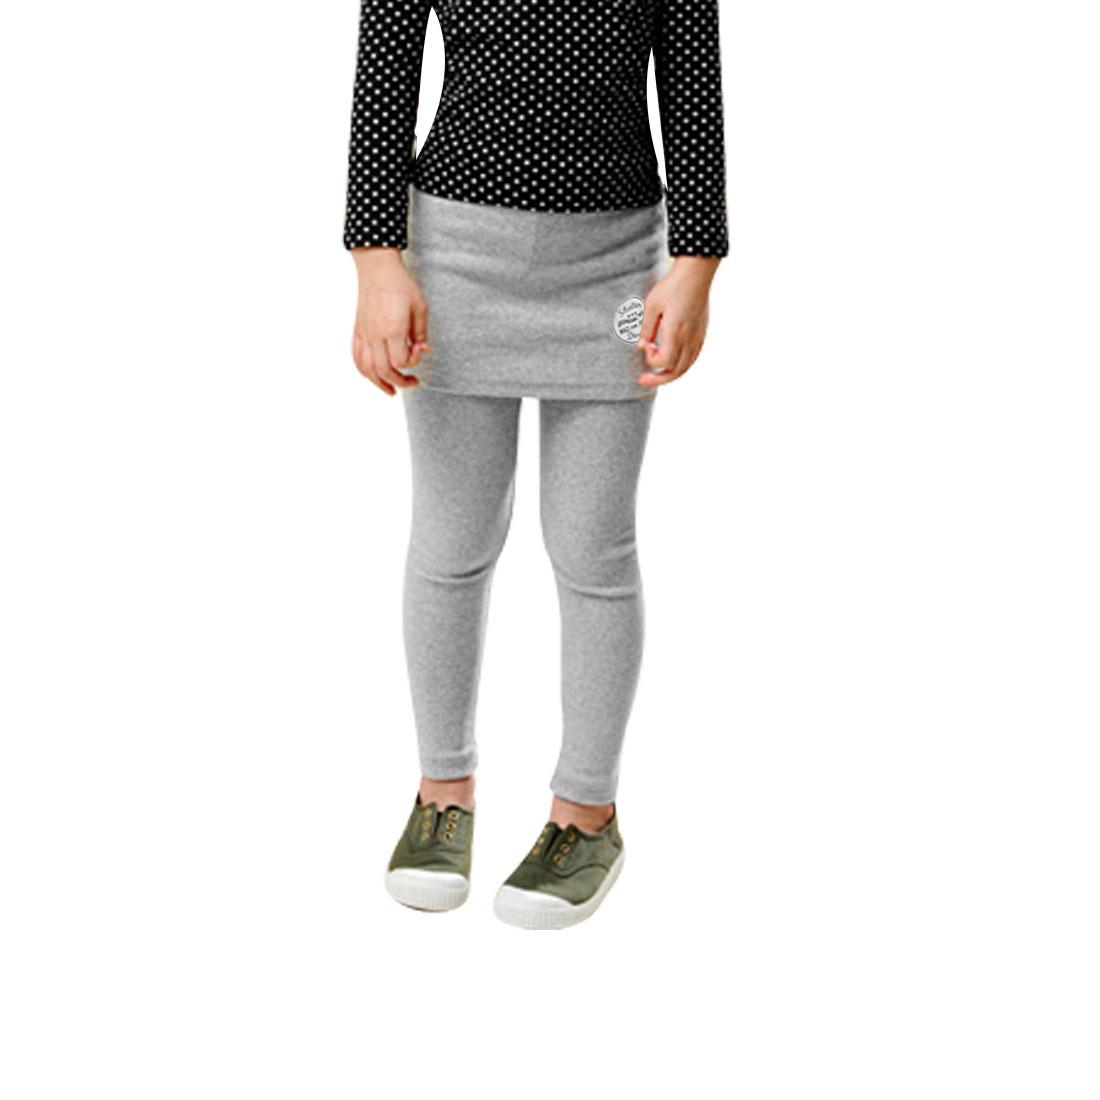 Girls Korea Style Stretchy Waistband Stylish Pantskirt Leggings Gray EU 6